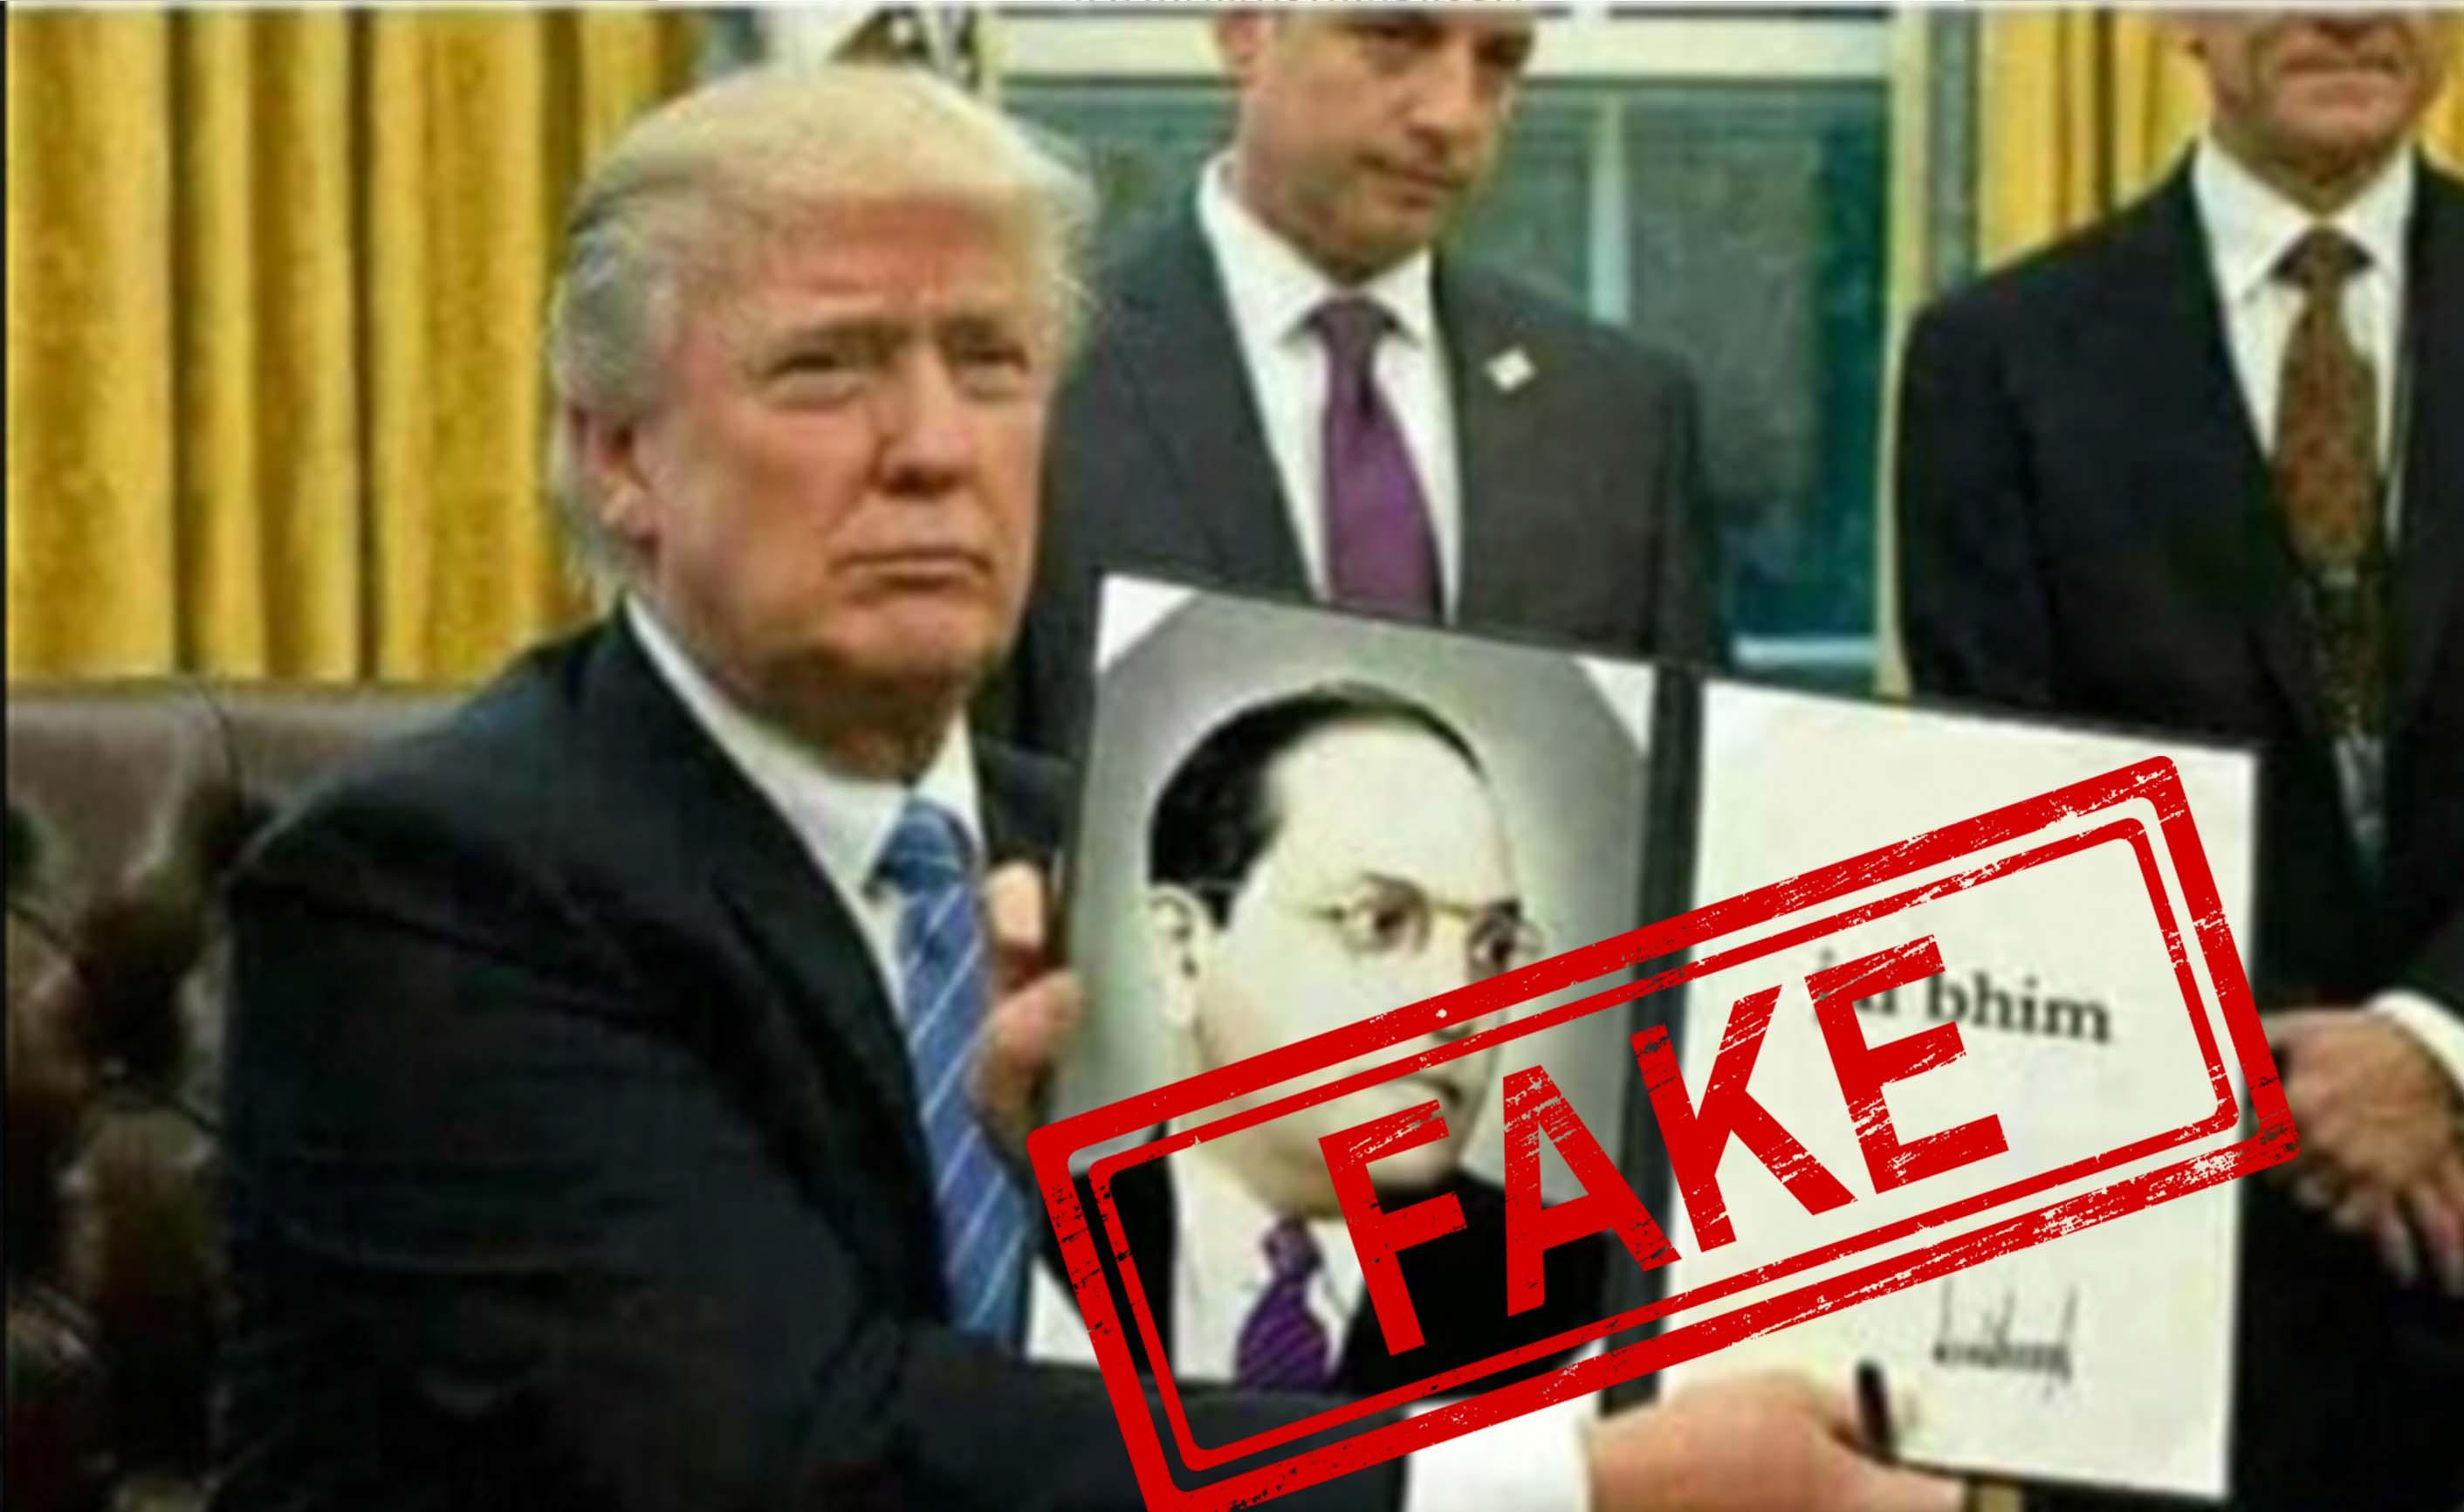 BR Ambedkar, Constitution, US, President, Donald Trump, NewsMobile, Mobile, News, India, World, Fact Check, Fact Checker, FAKE